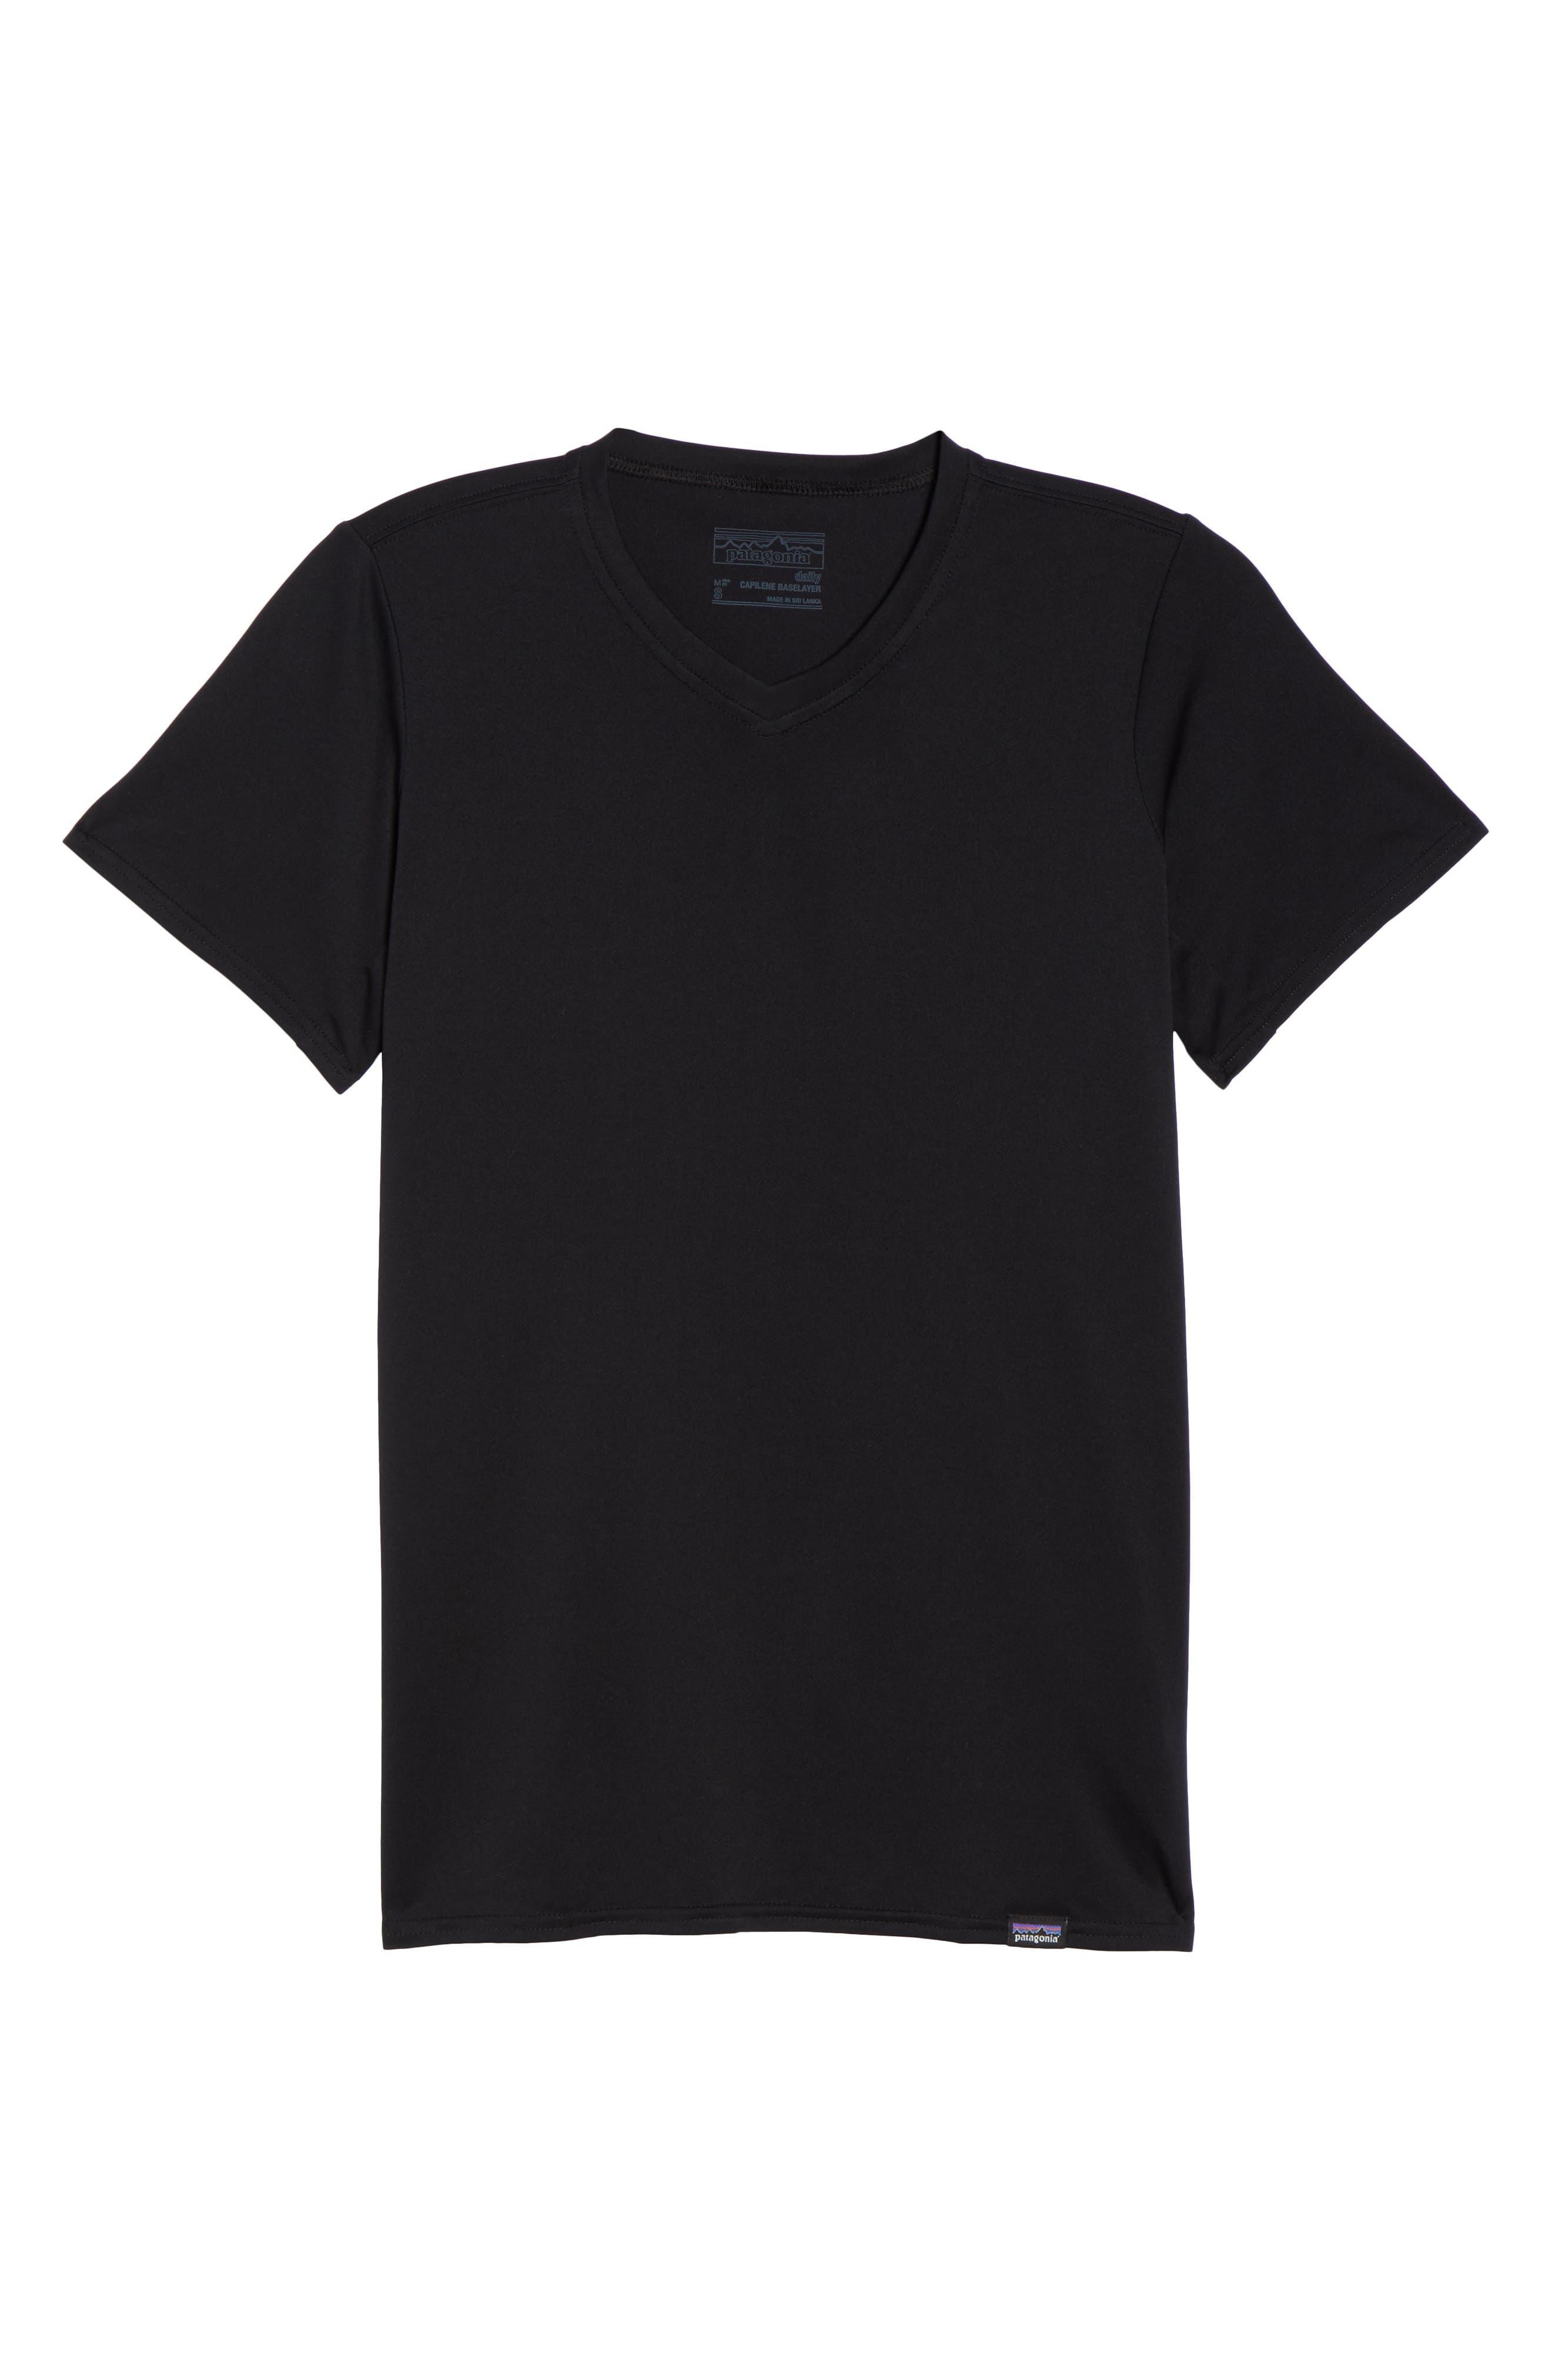 Capilene<sup>®</sup> Dailty T-Shirt,                             Alternate thumbnail 7, color,                             001